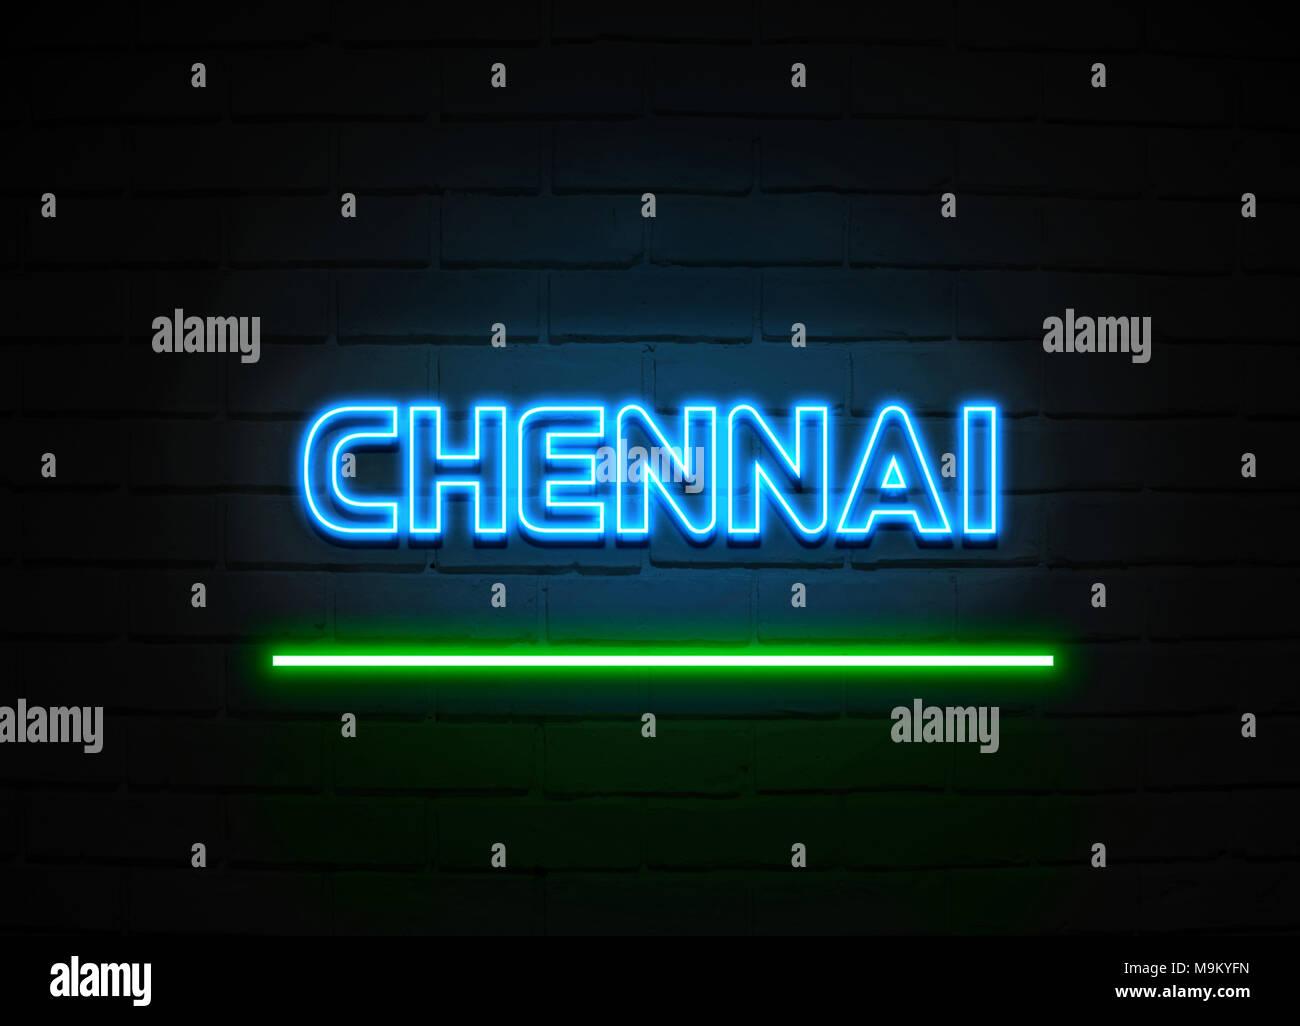 Chennai neon sign Glowing Neon Sign